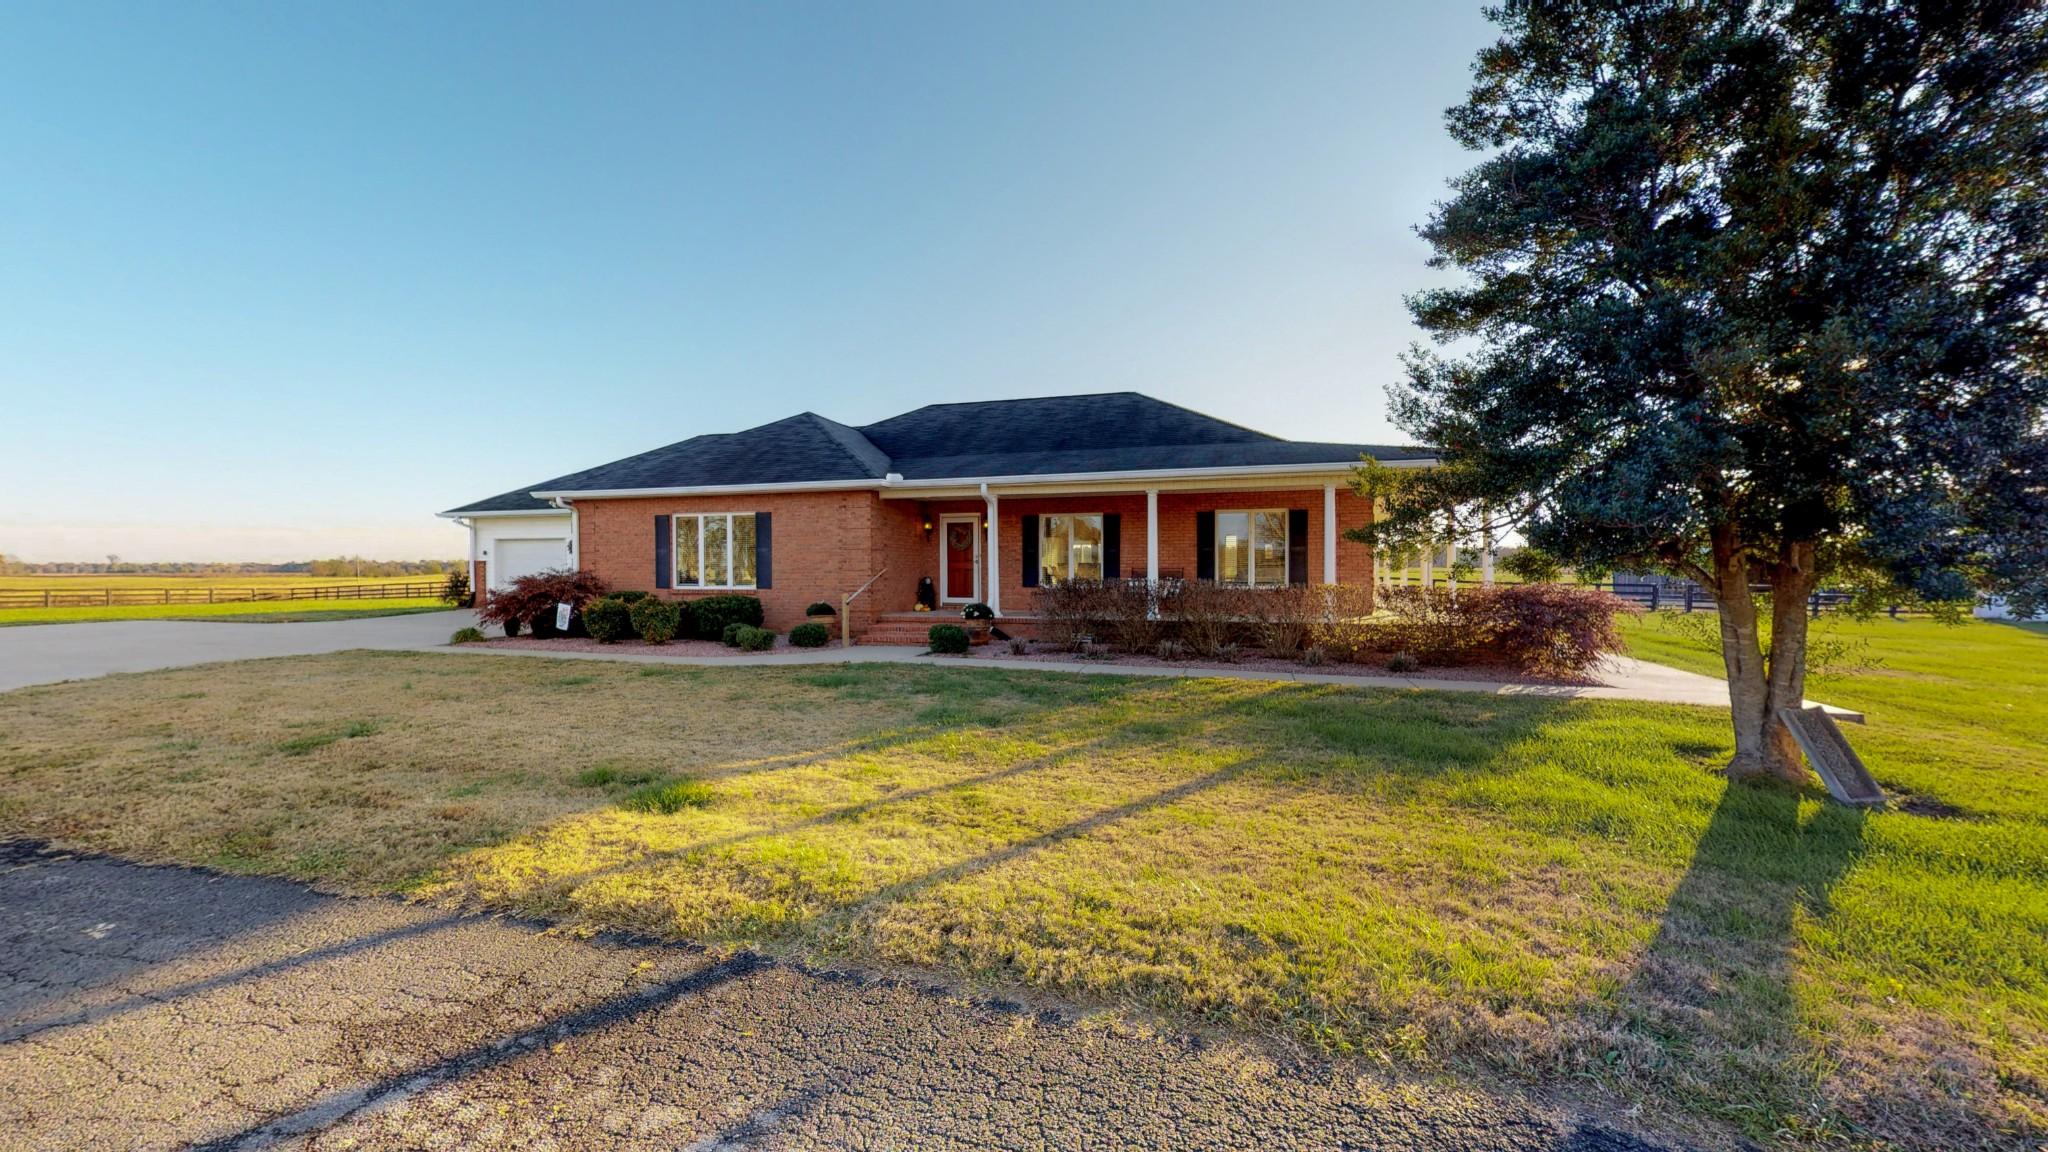 4767 Barren Plains Road, Springfield, TN 37172 - Springfield, TN real estate listing